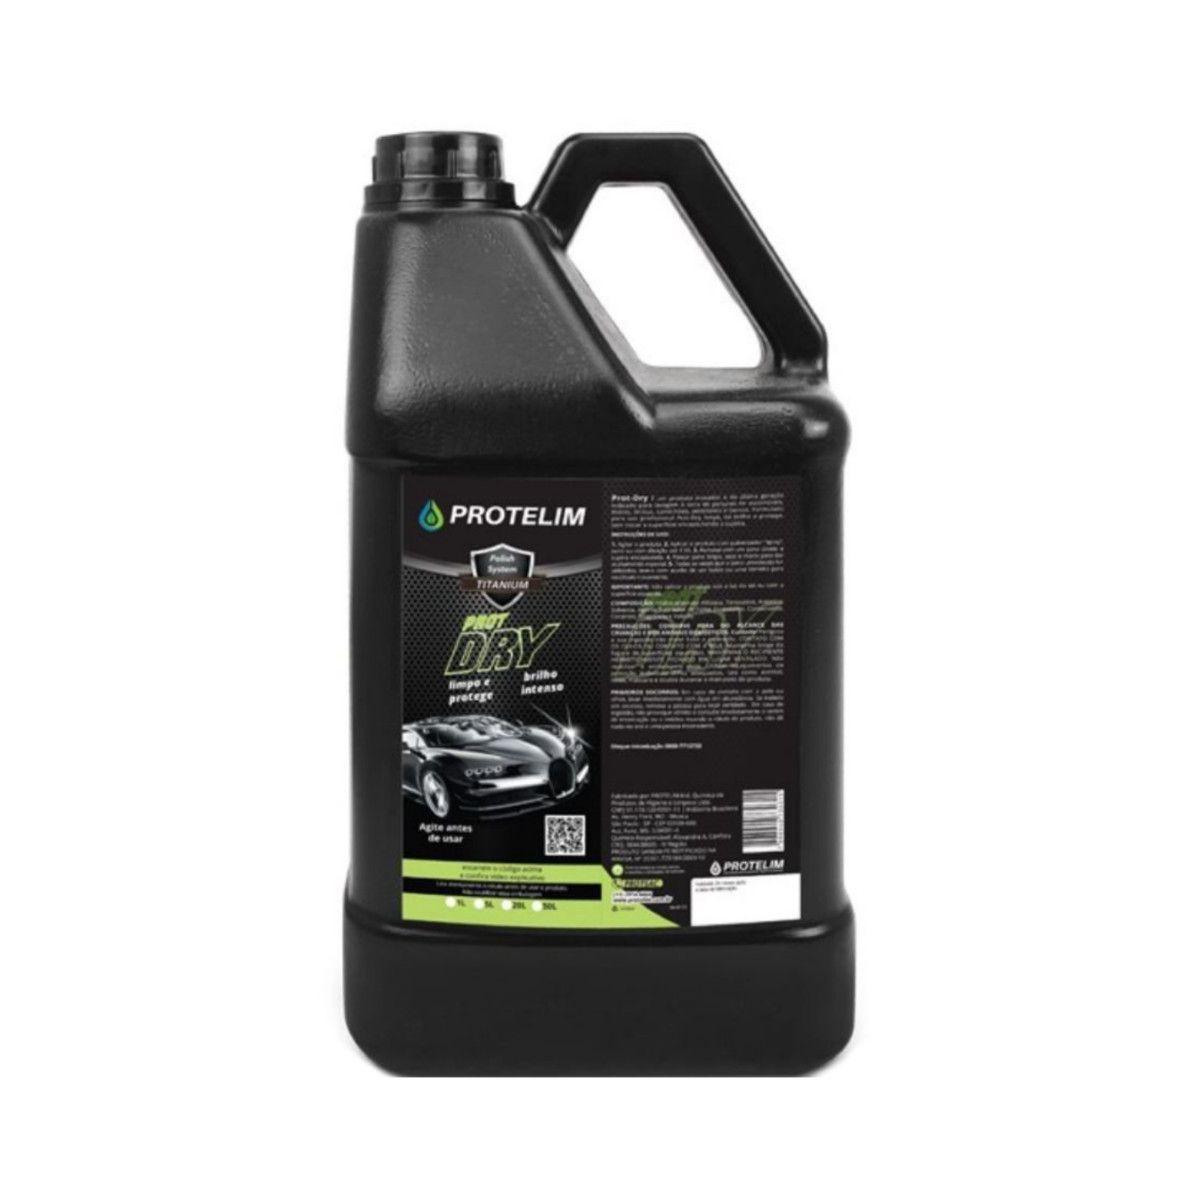 Limpador A Seco Prot-Dry Protelim 5L + Desengraxante Mult 200 5L Protelim